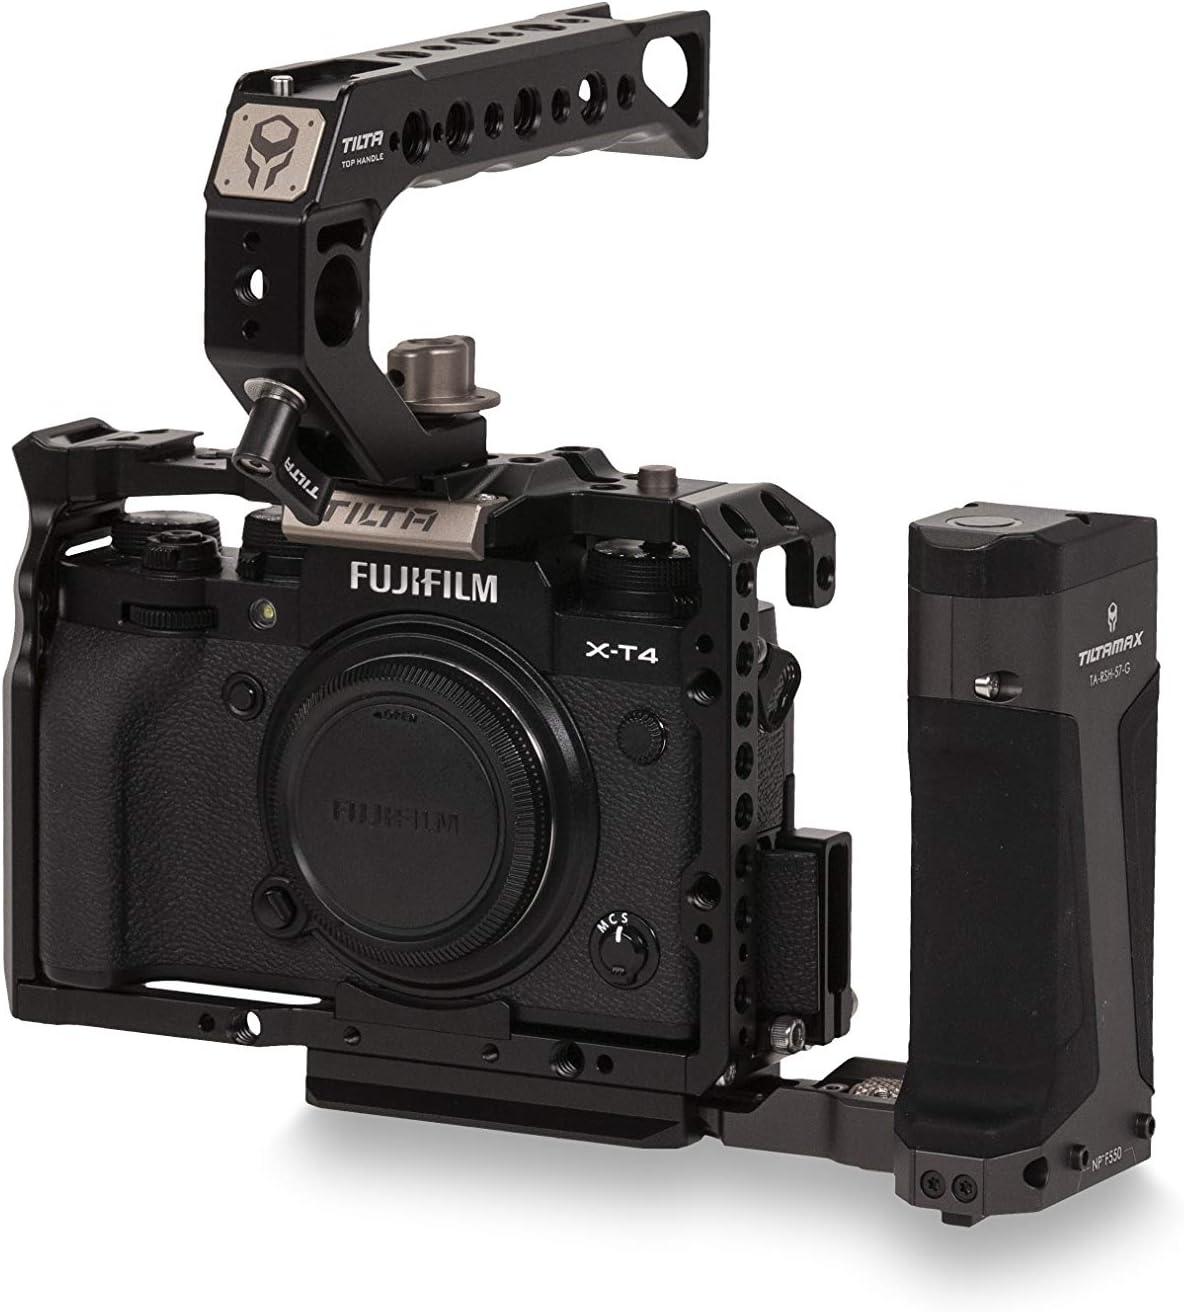 Max 84% OFF Tiltaing Fujifilm X-T3 X-T4 B - Branded goods Kit Black